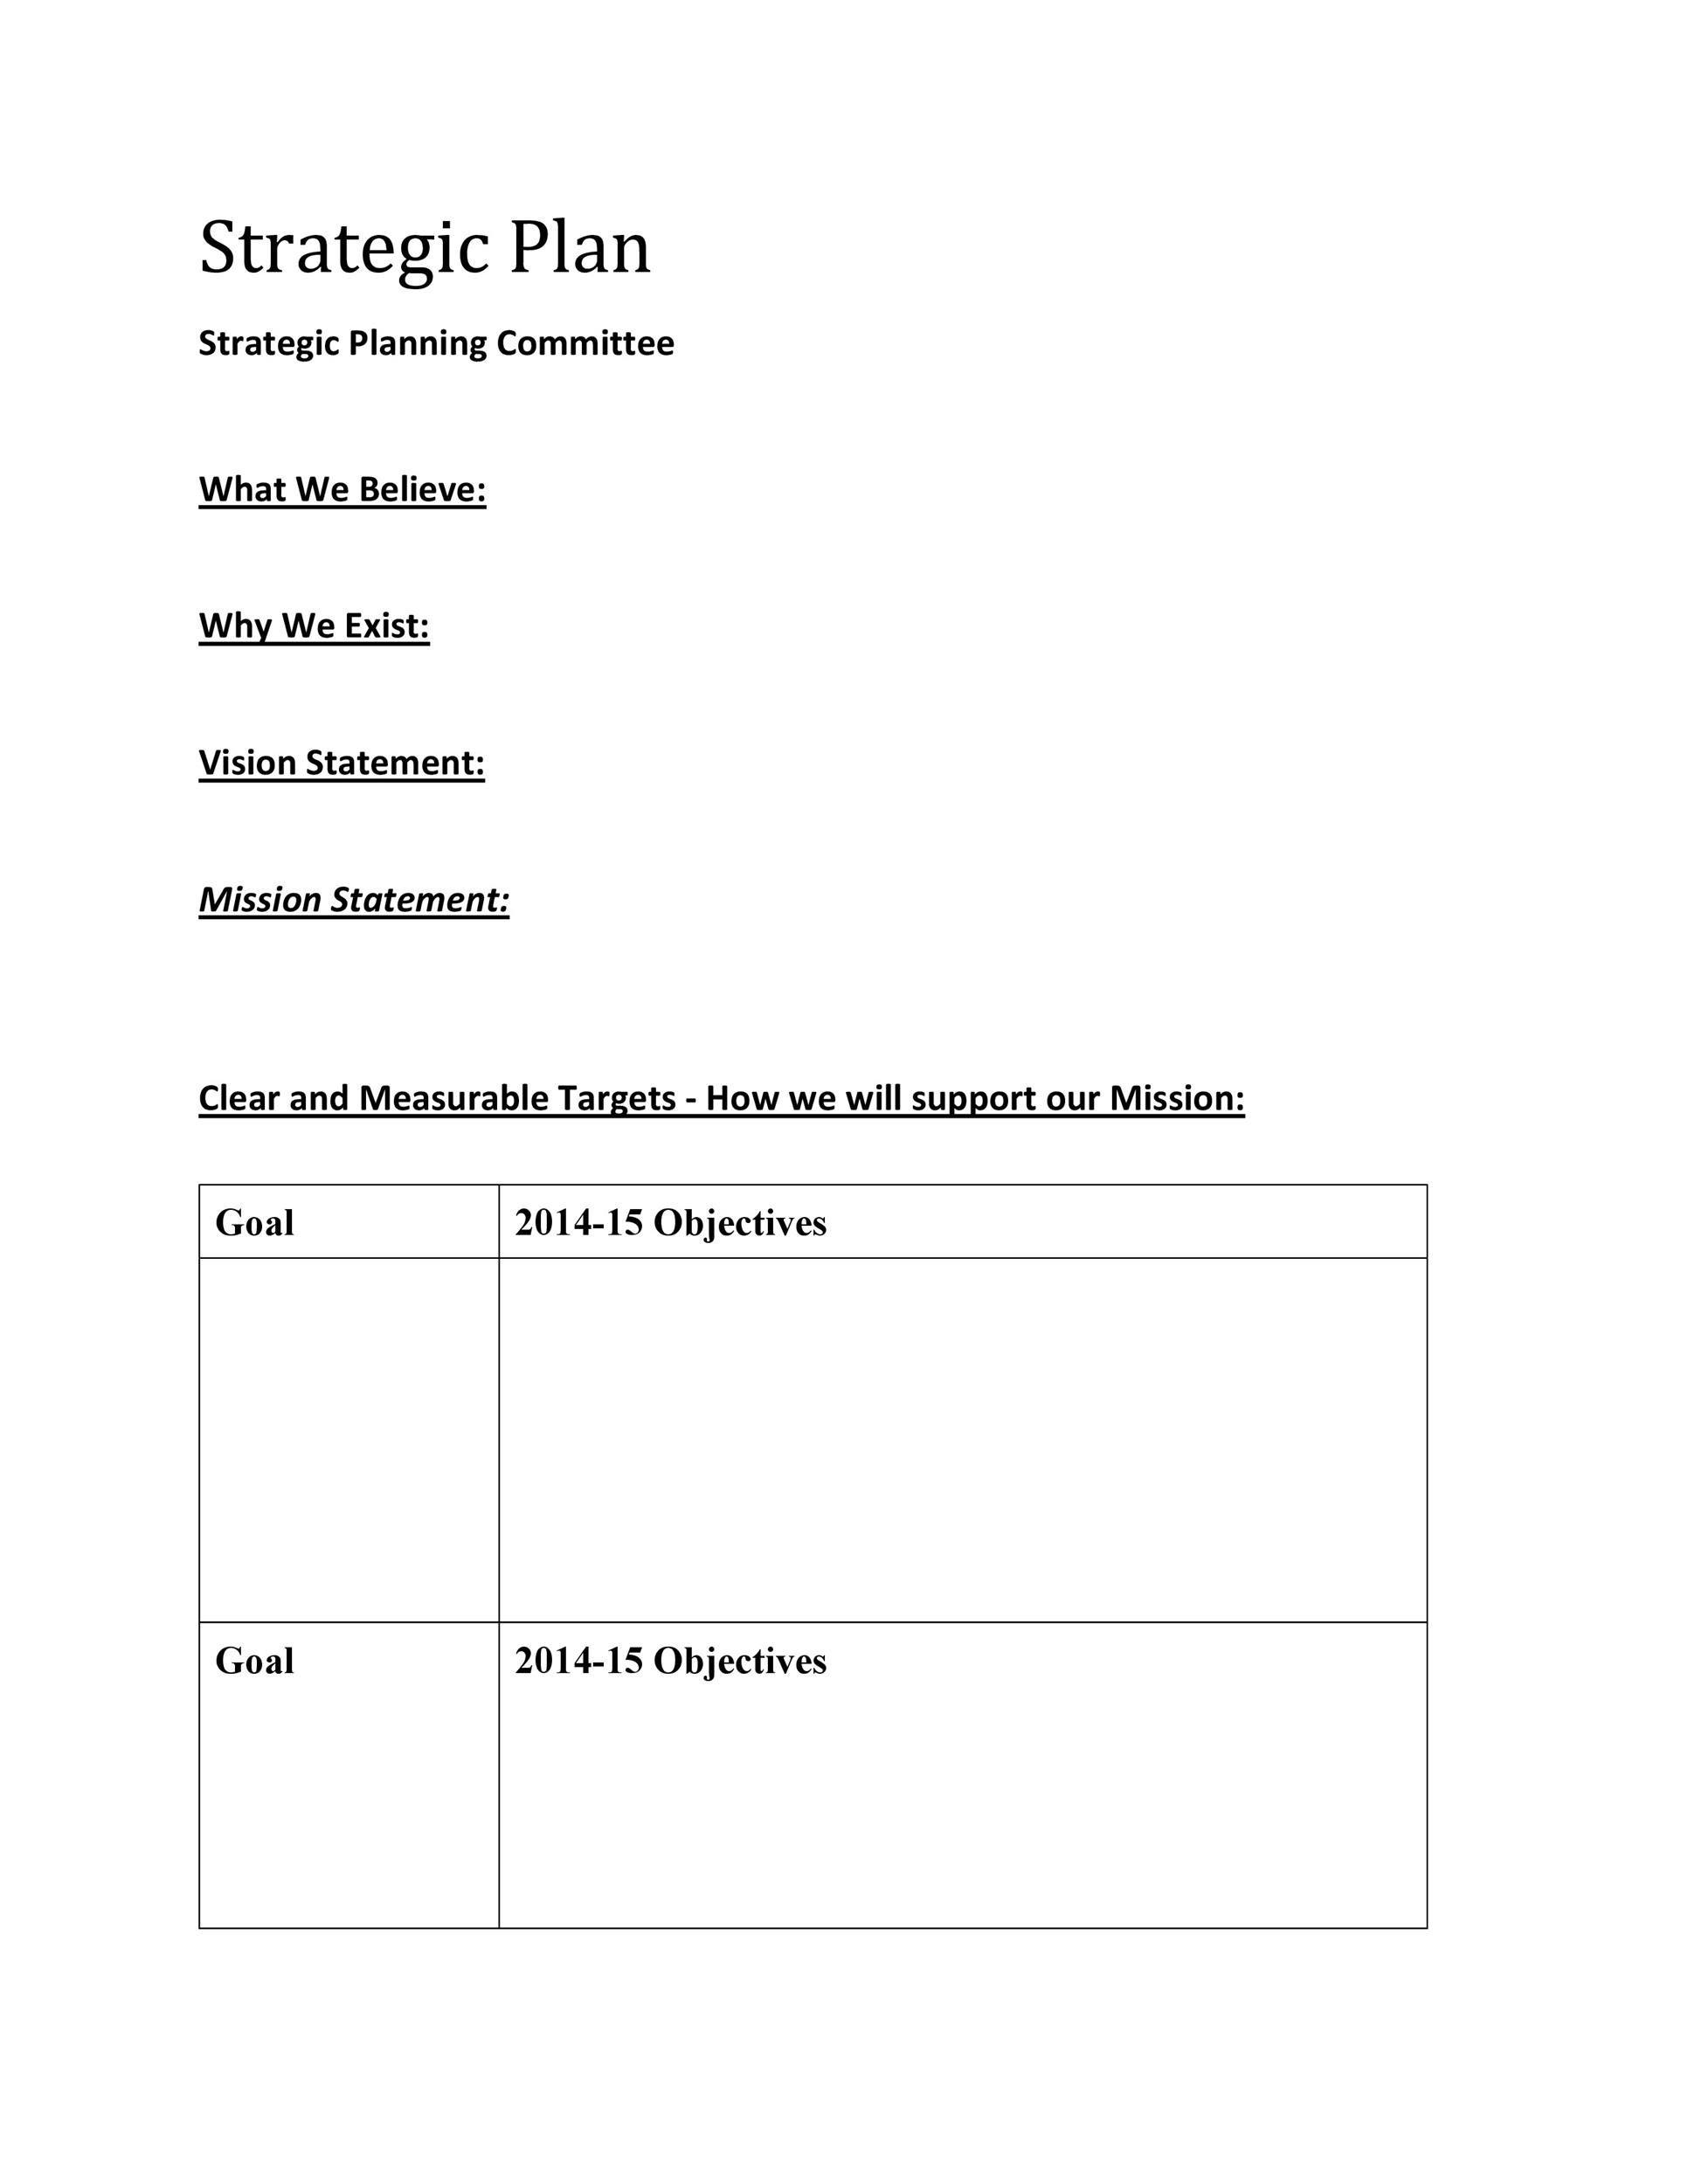 009 Breathtaking Strategic Plan Word Template High Resolution  Document Microsoft MarketingFull